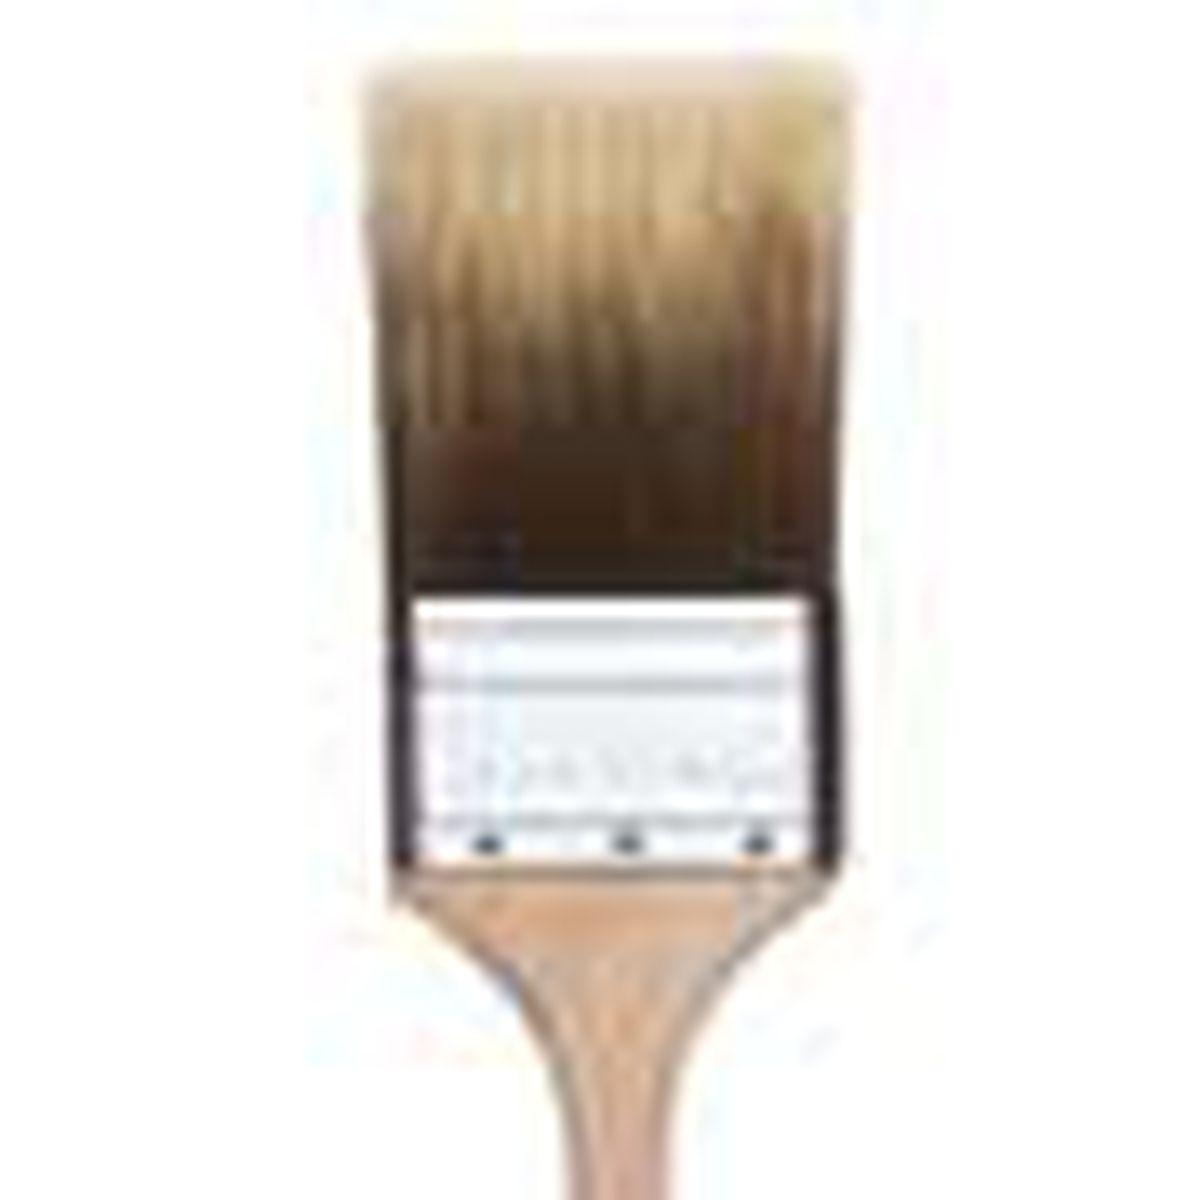 chisel-tip paintbrush